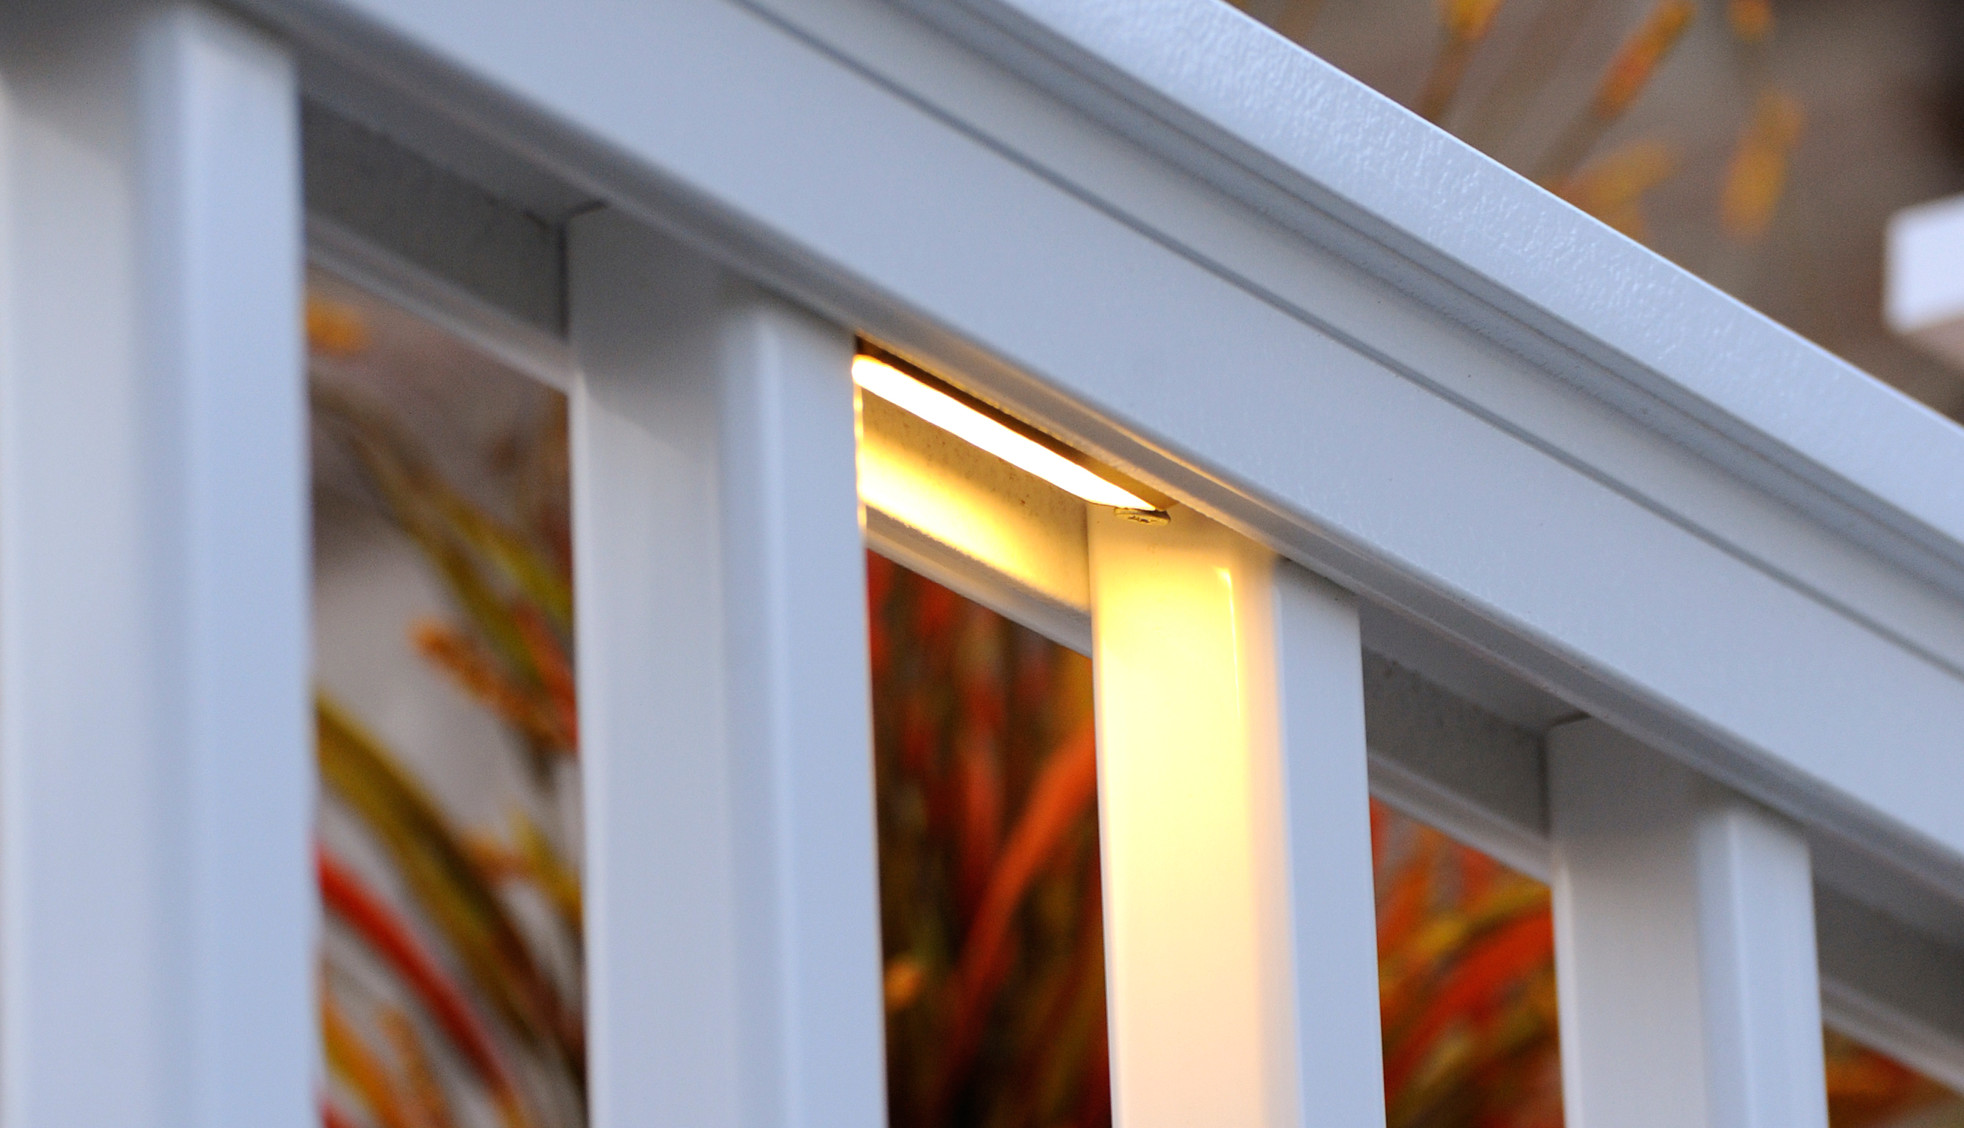 Luces bajo barandal para cubiertas de TimberTech: imagen 1